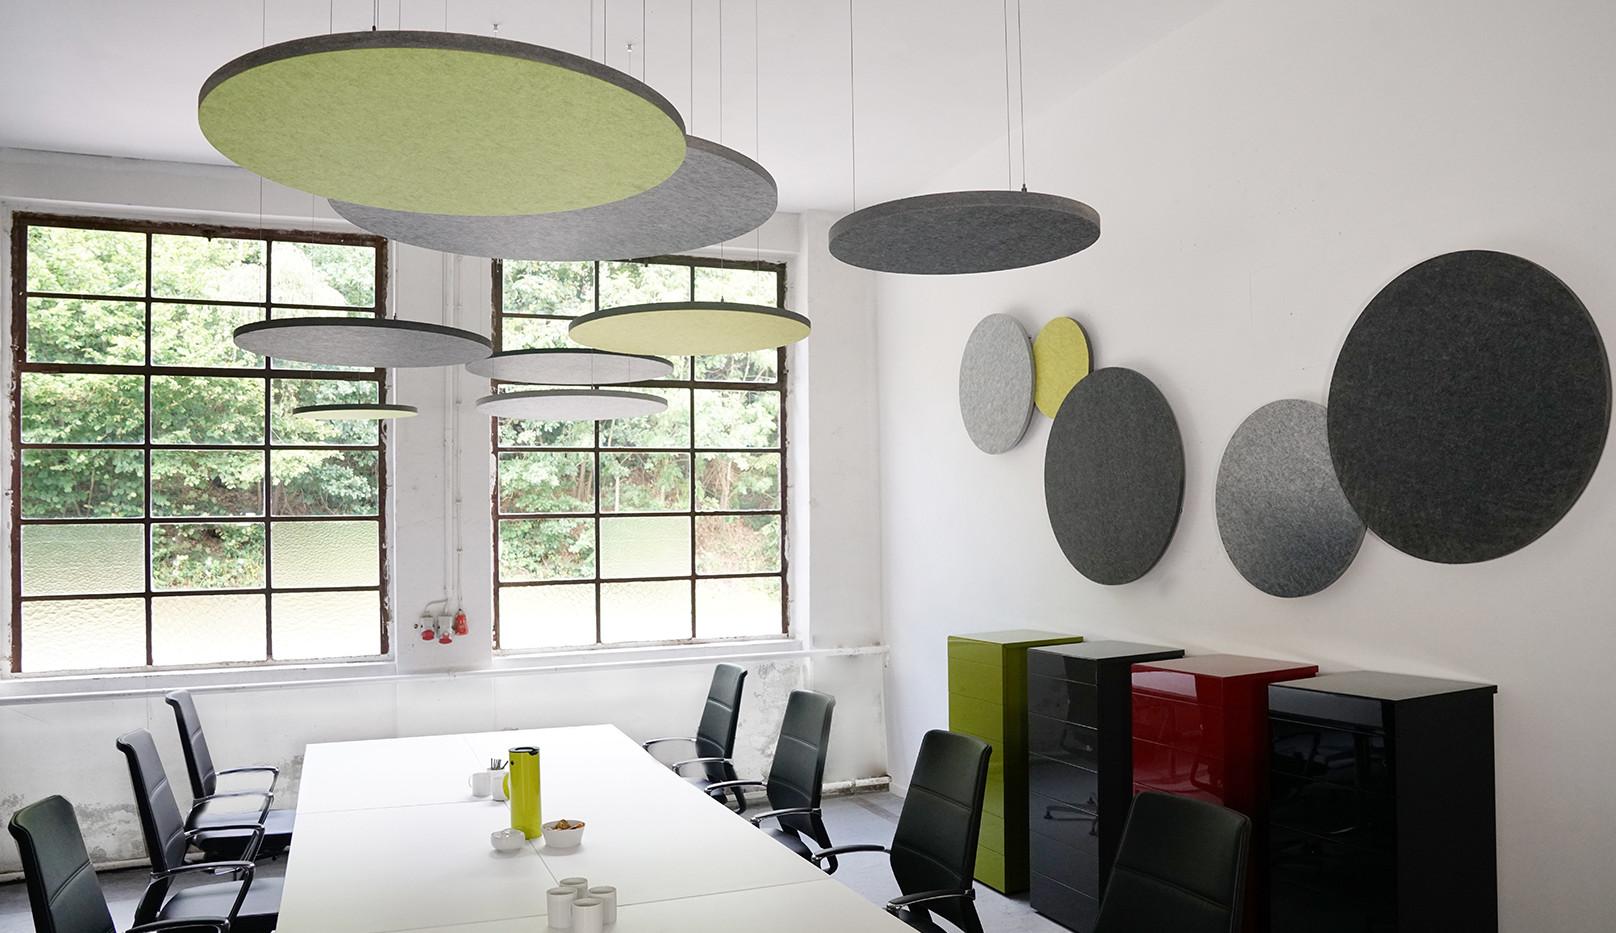 ceiling round milieu 2.jpg